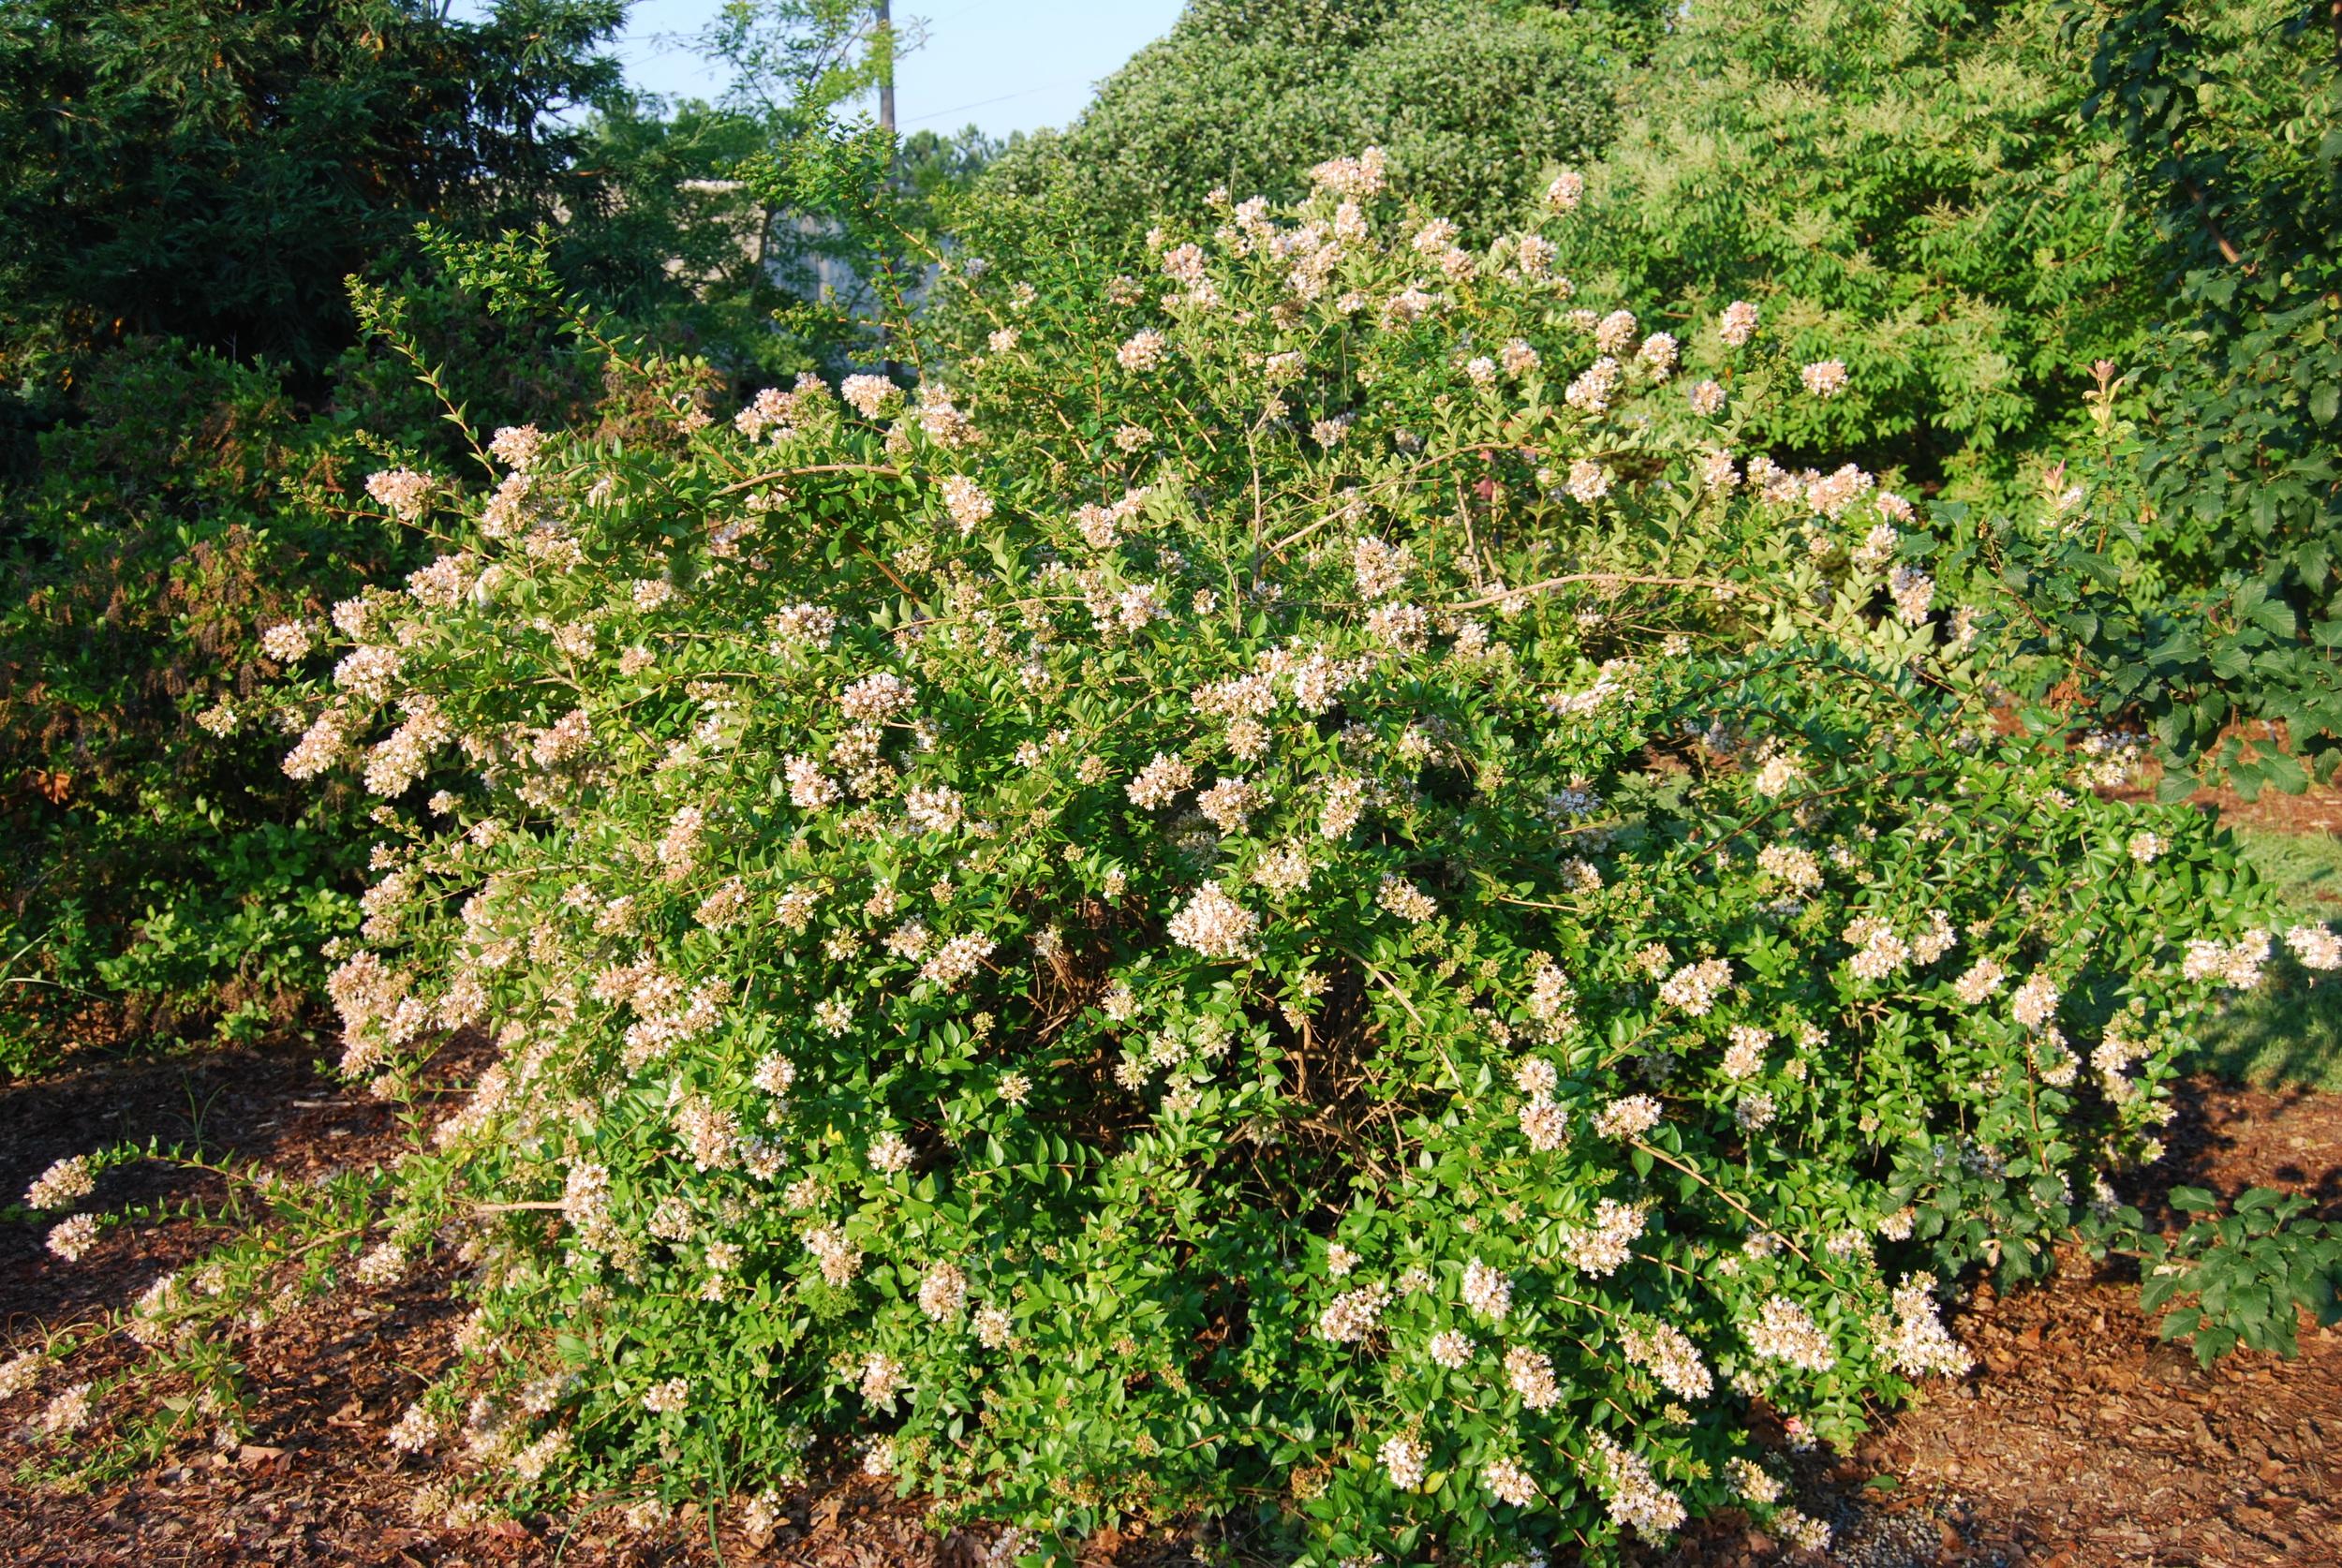 Abelia chinensis flowers all season long.